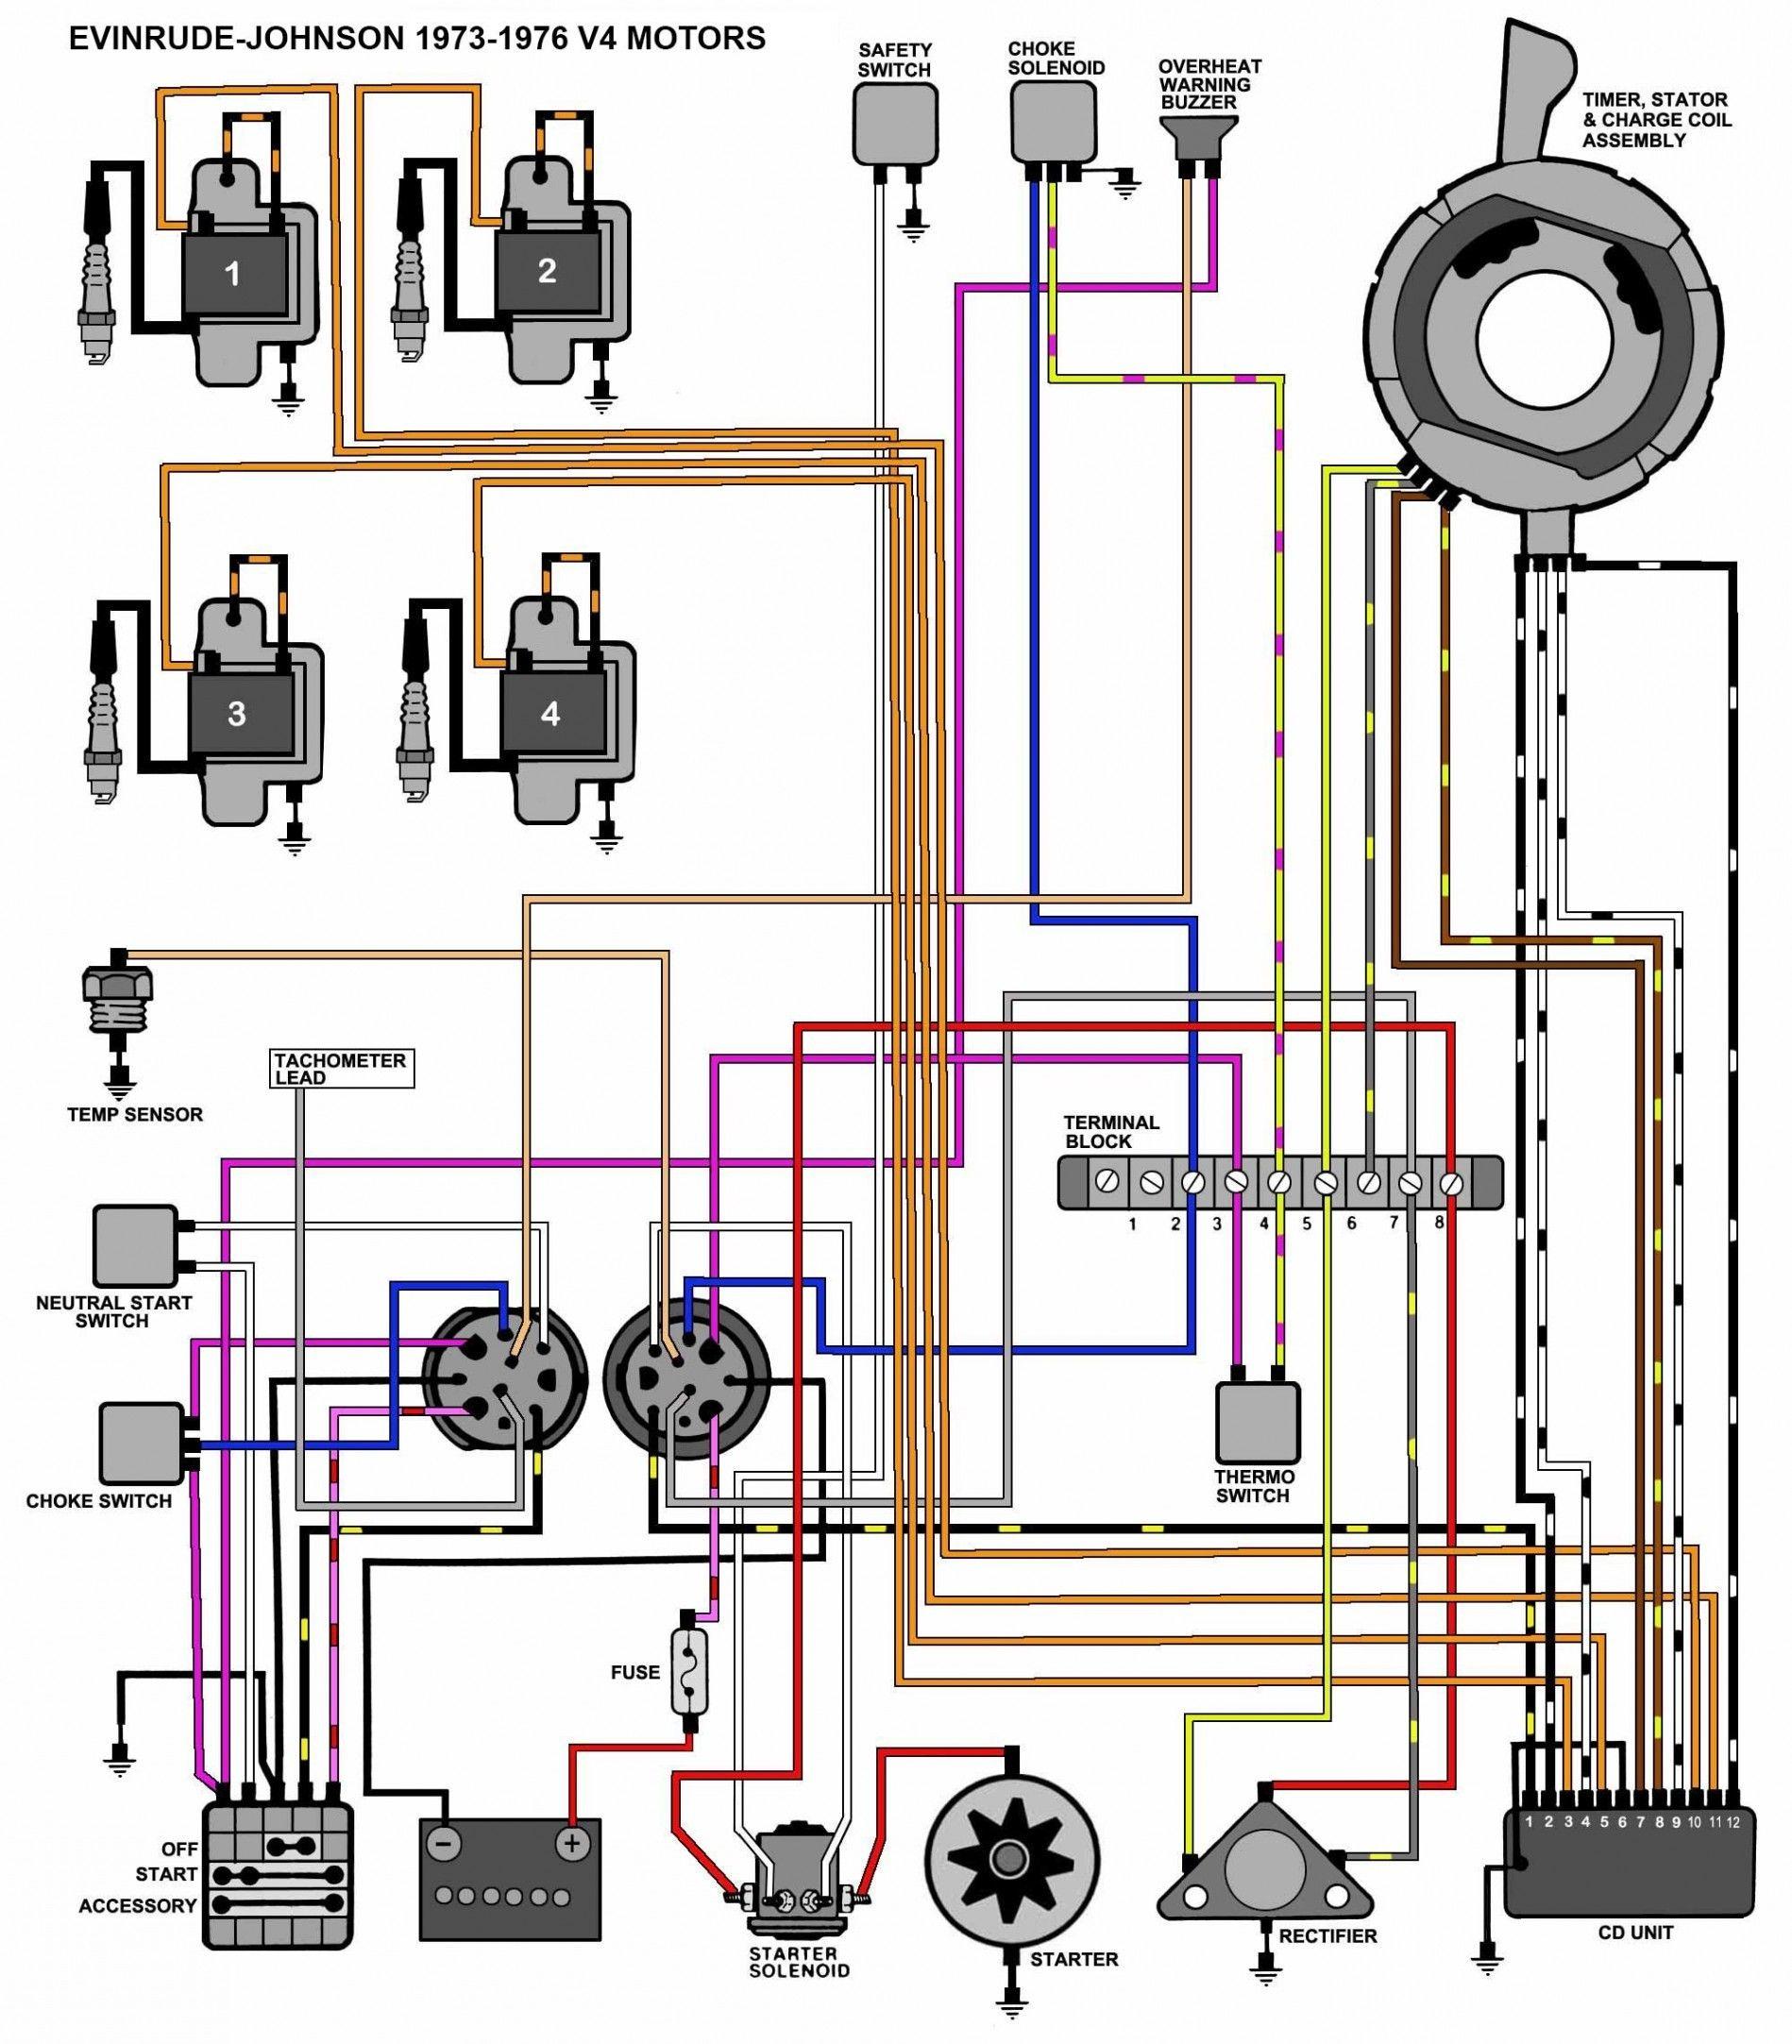 yamaha outboard wiring diagram pdf | diagram, electronics basics, boat  wiring  pinterest